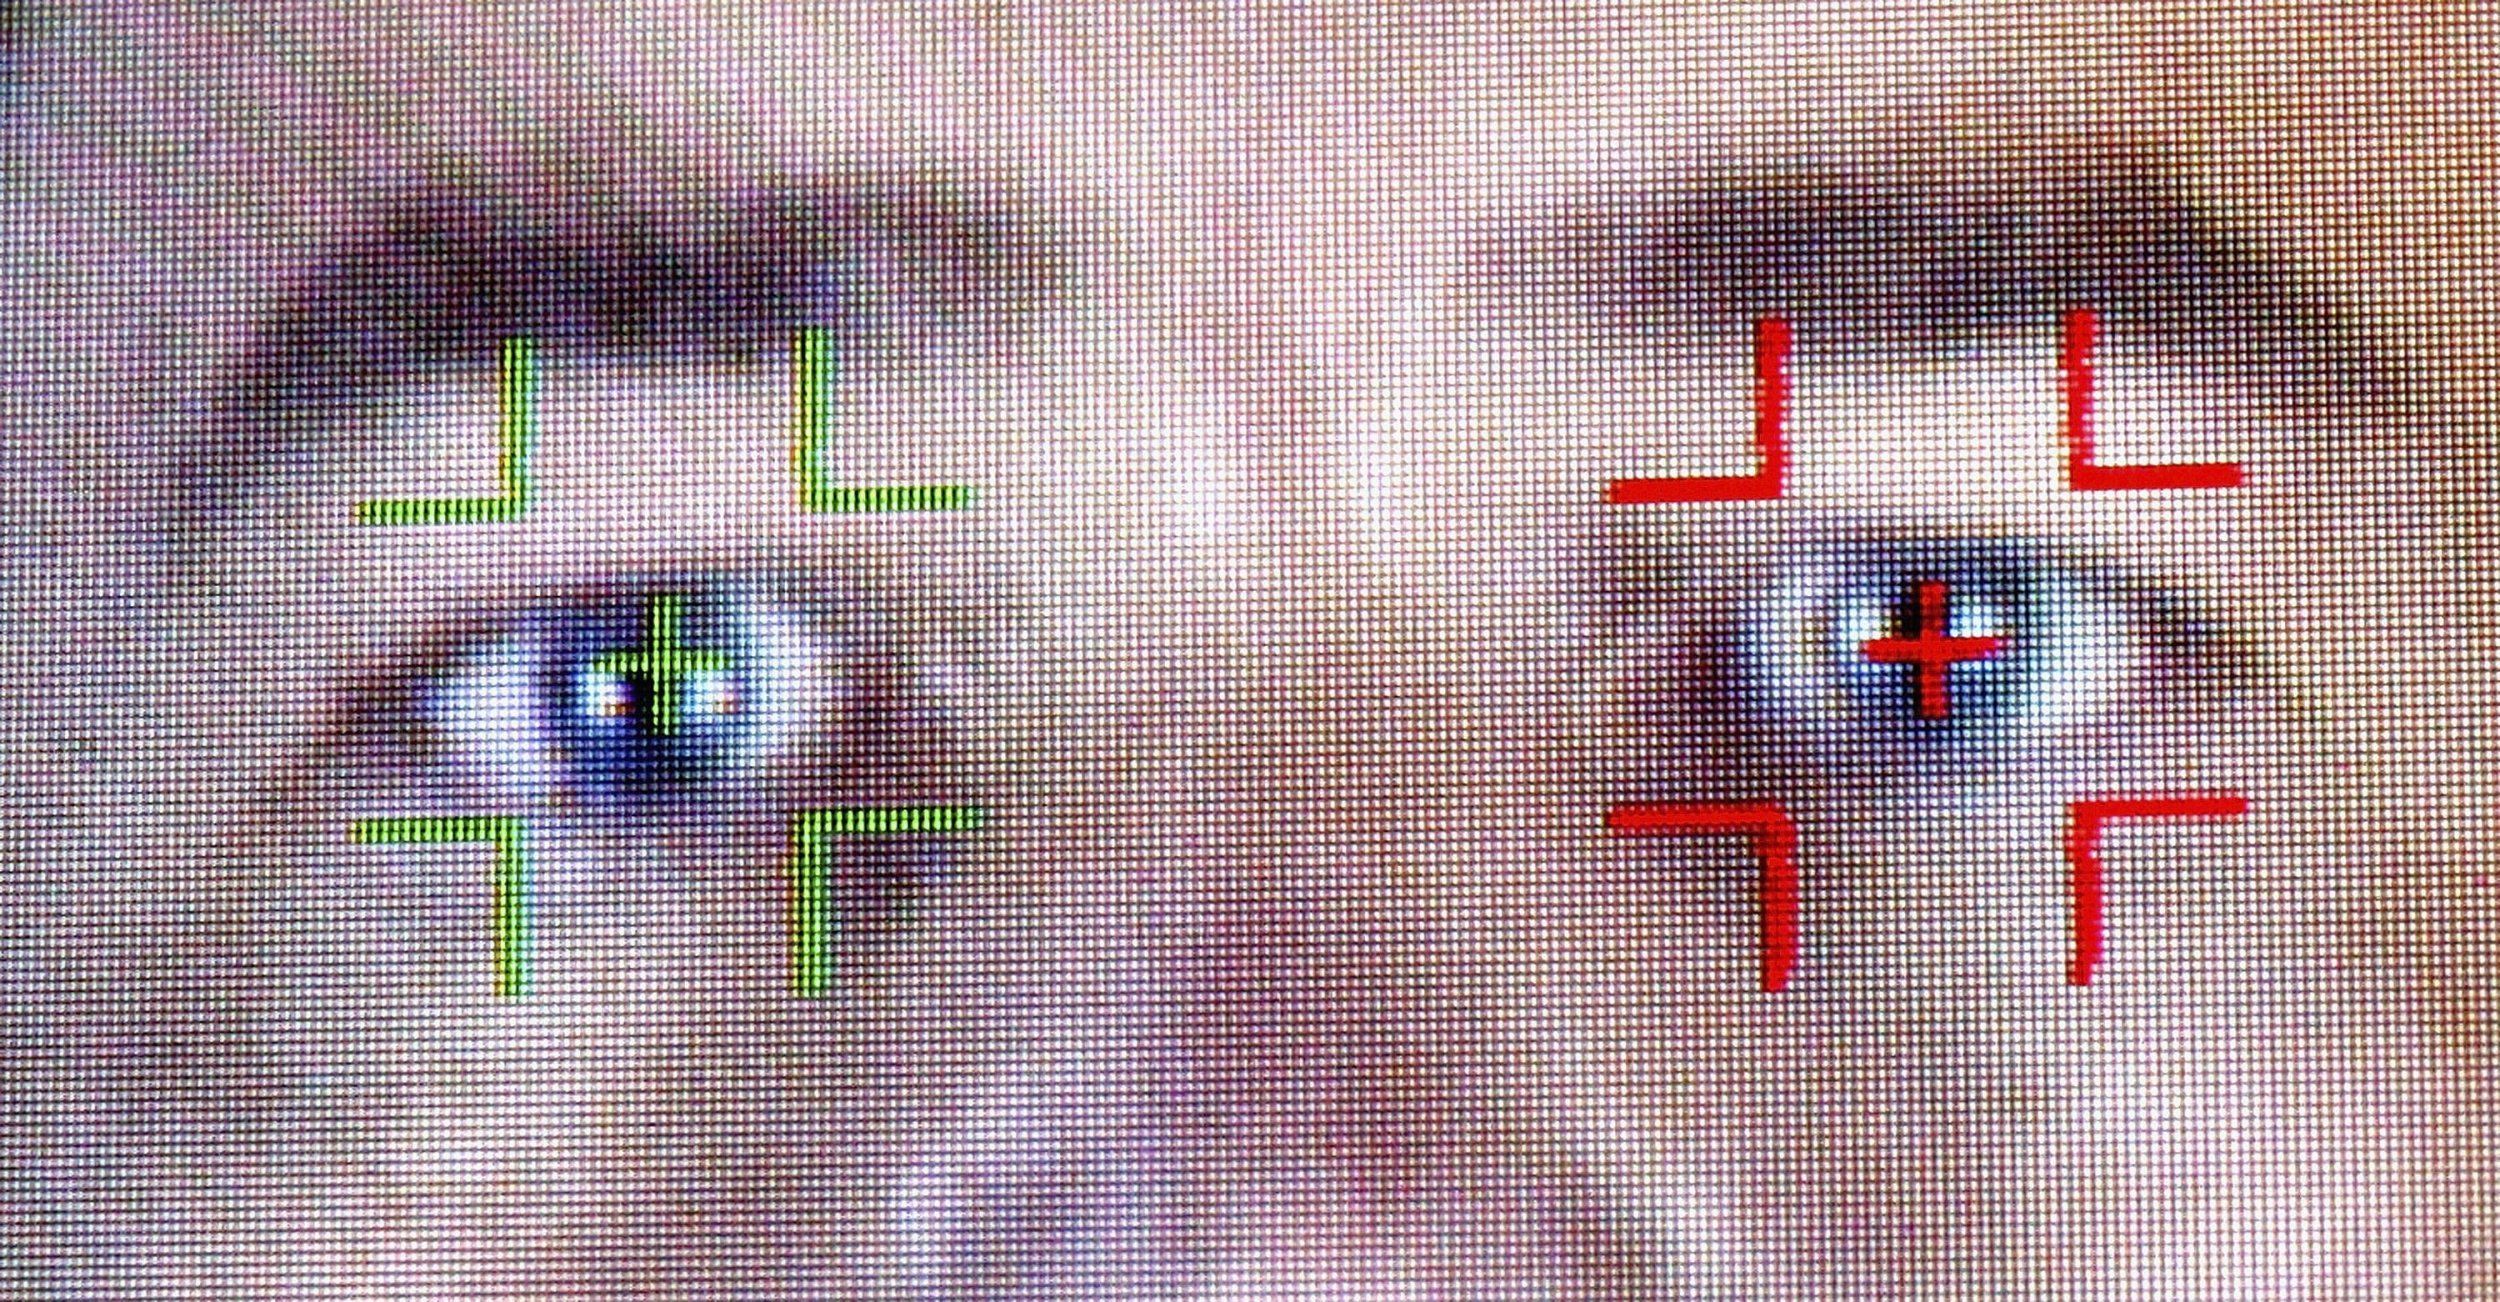 facial recognition biometrics Facebook